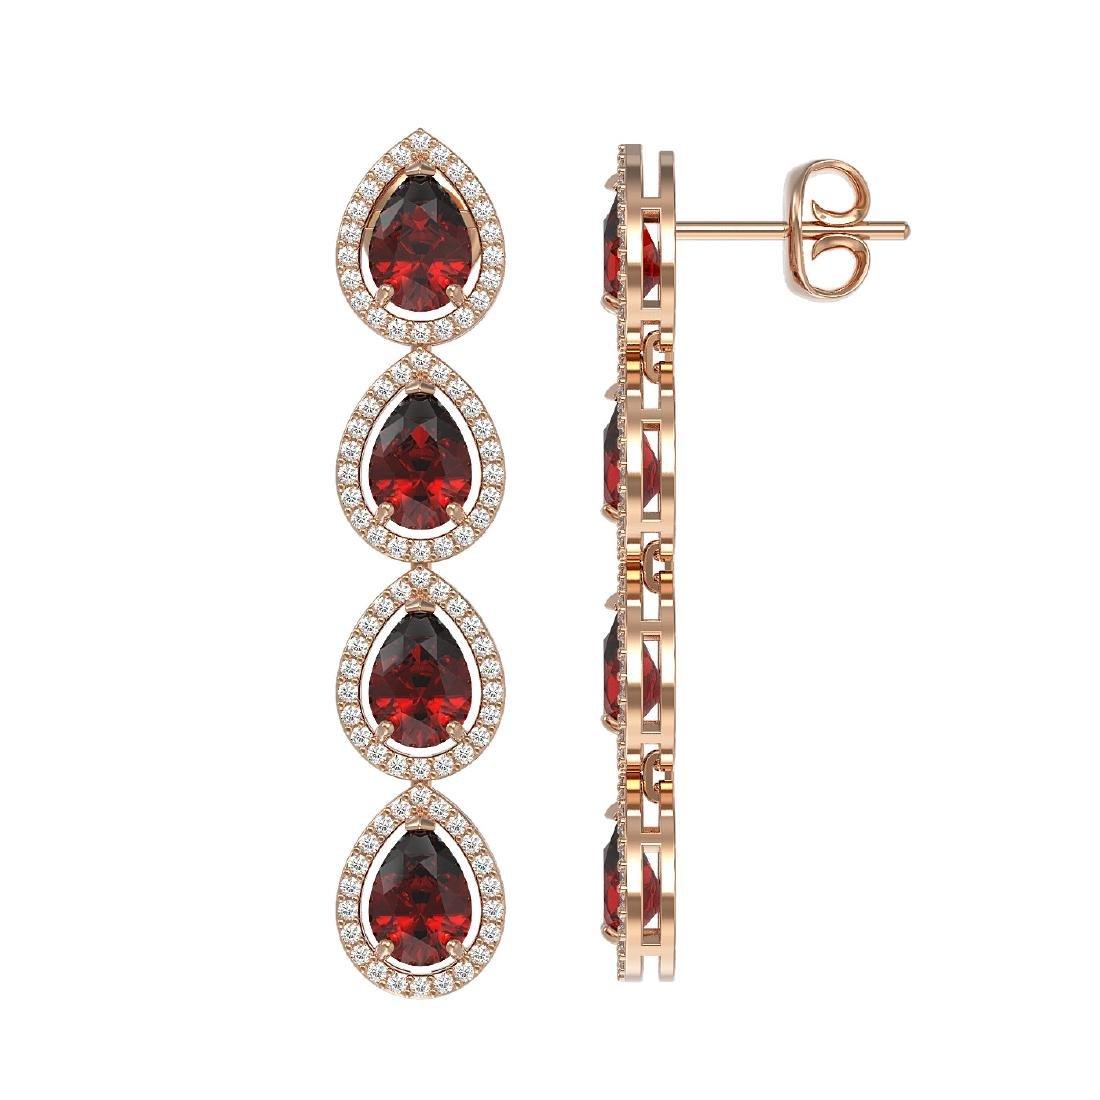 8.2 CTW Garnet & Diamond Halo Earrings 10K Rose Gold - 2